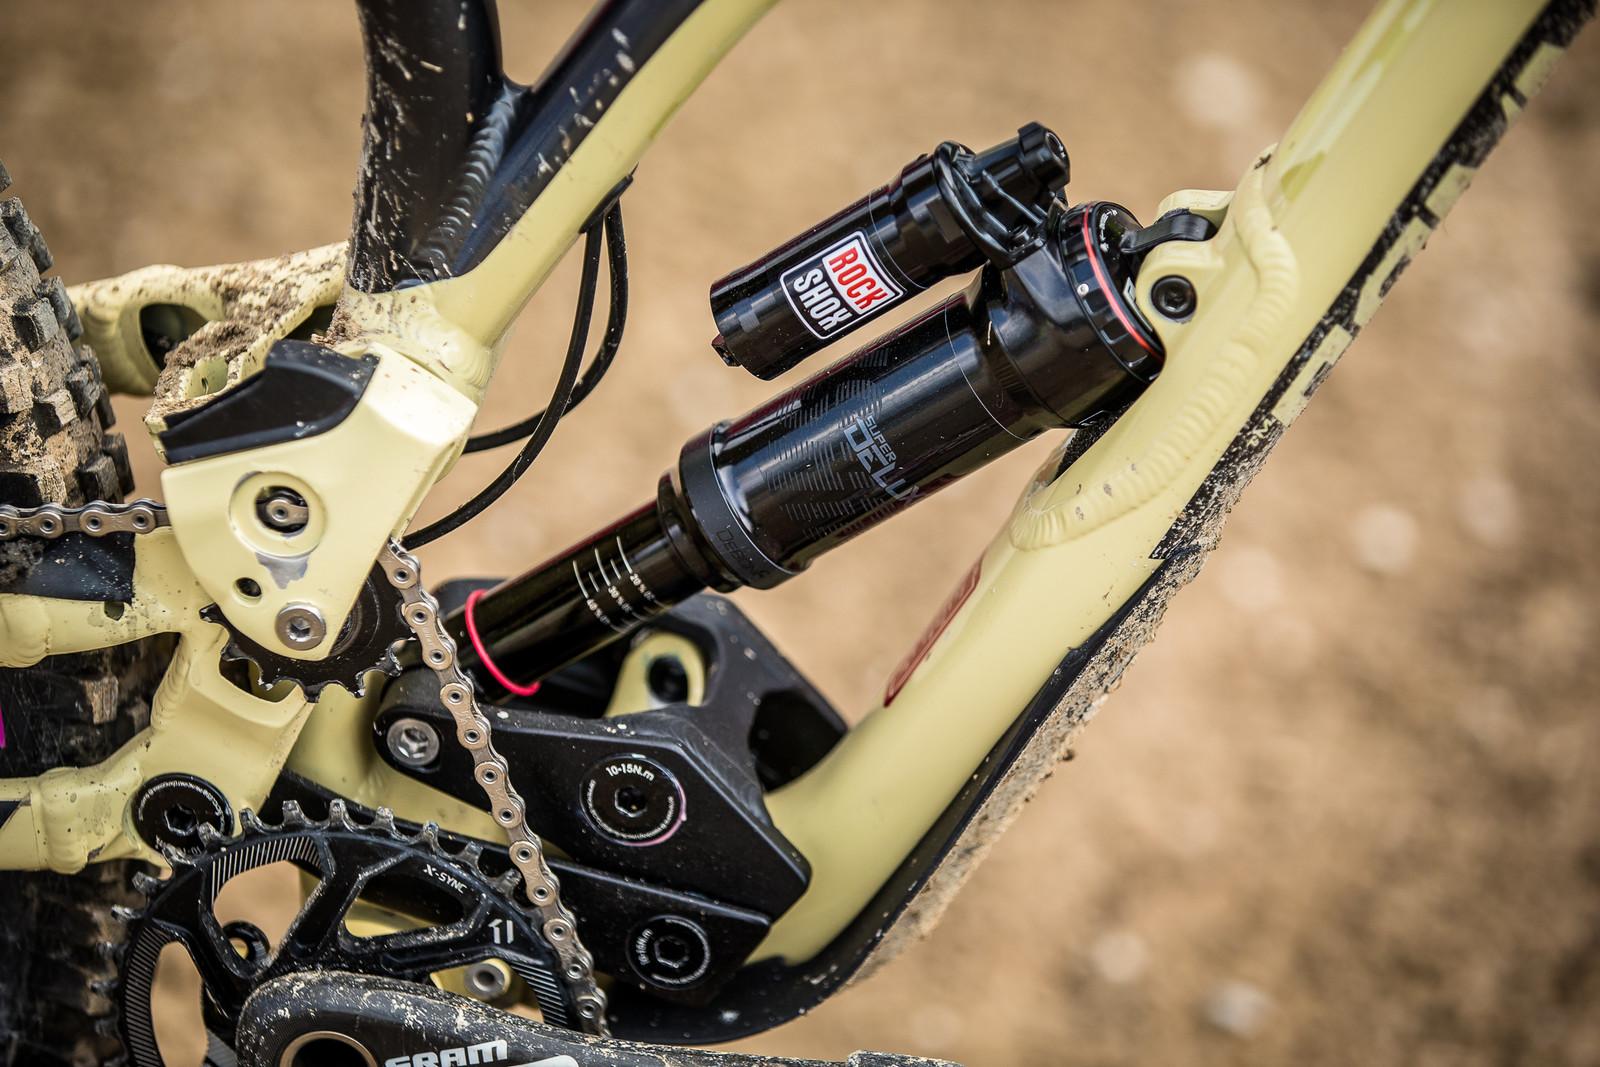 RockShox SuperDeluxe - WINNING BIKE - Amaury Pierron's Commencal Supreme DH 29 - Mountain Biking Pictures - Vital MTB